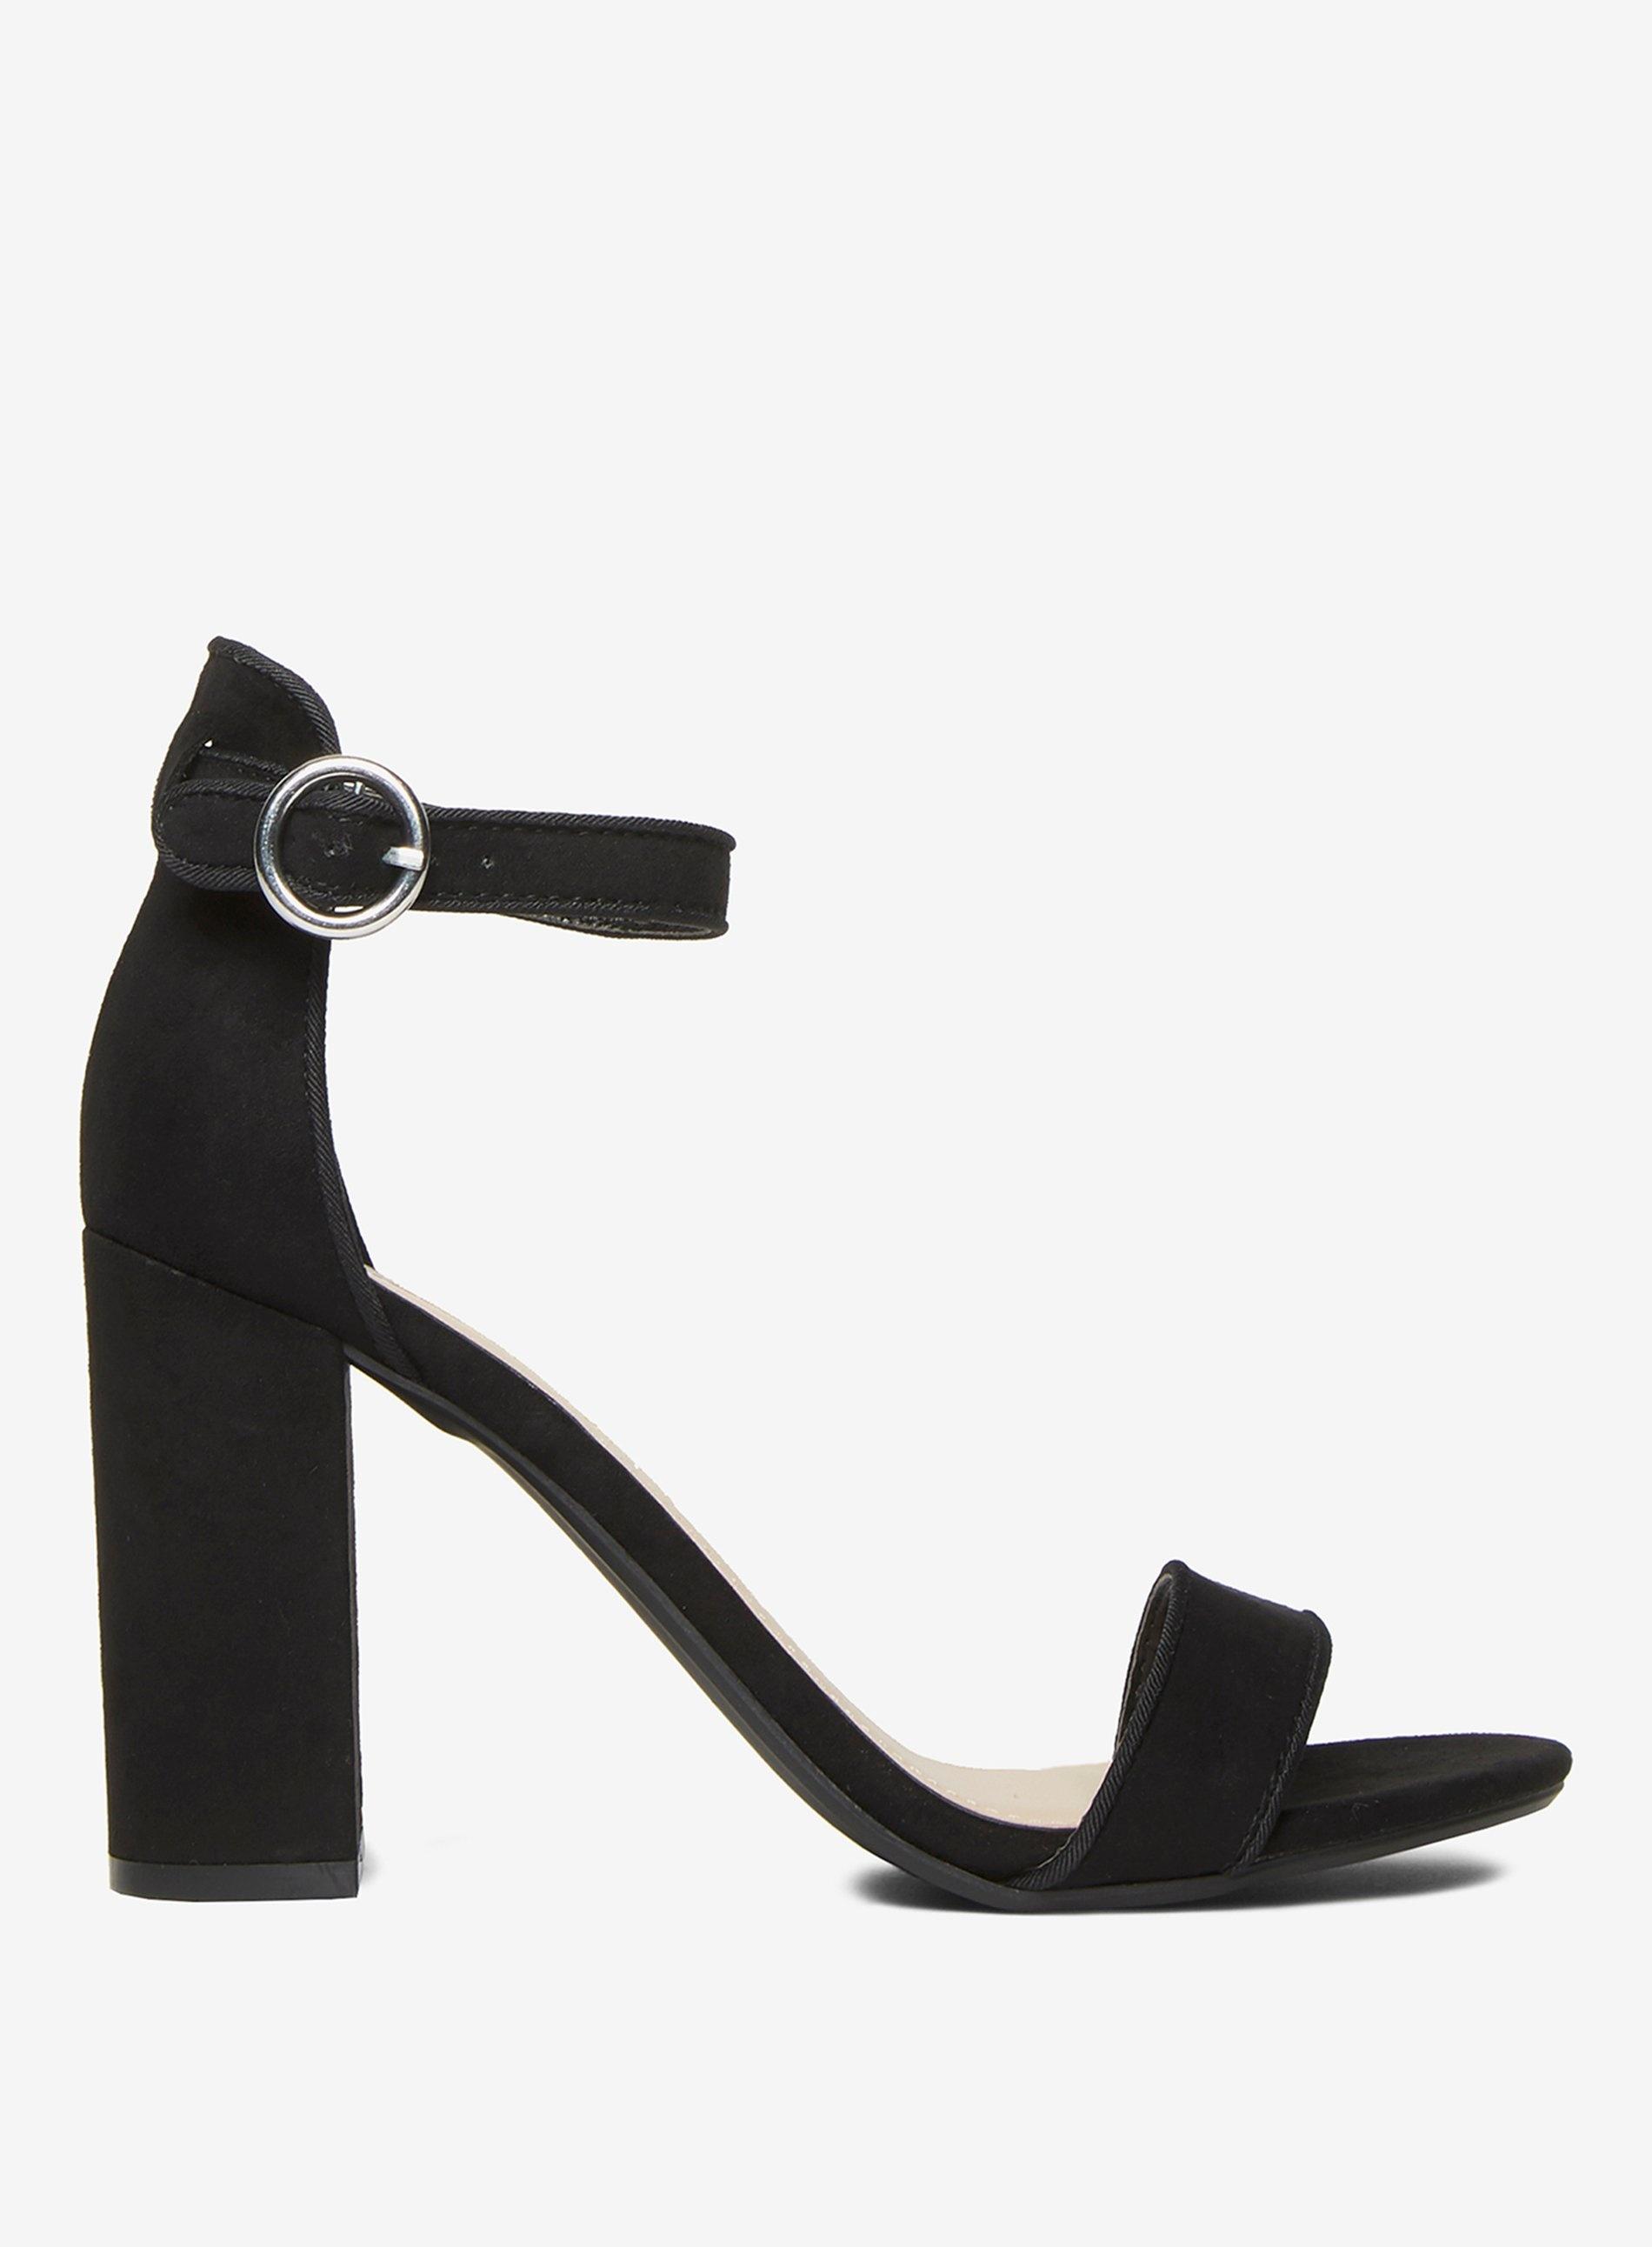 662ea462a1 Lyst - Dorothy Perkins Black Shimmy Block Heeled Sandal in Black